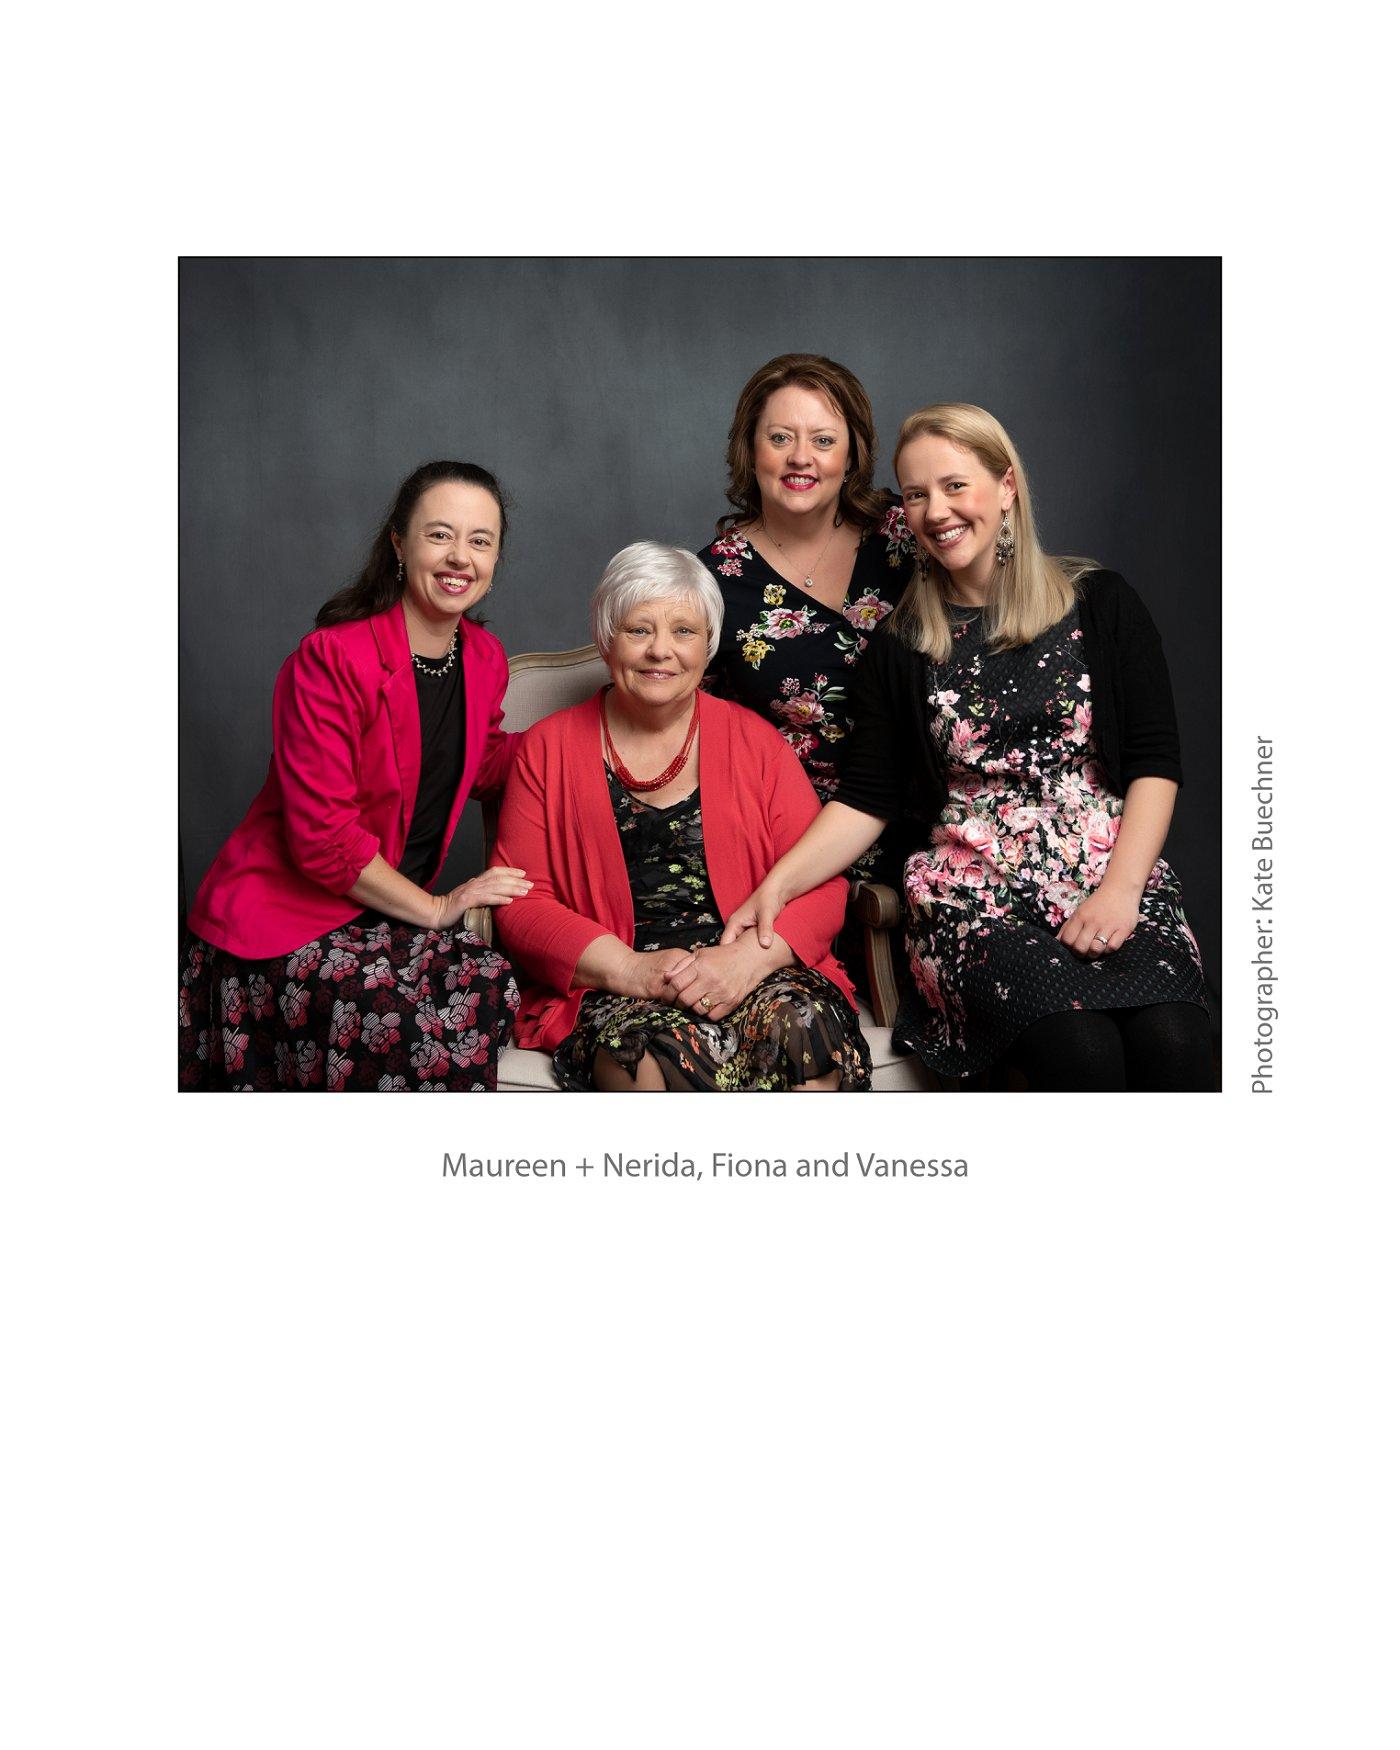 family-photographer-sydney (8).jpg